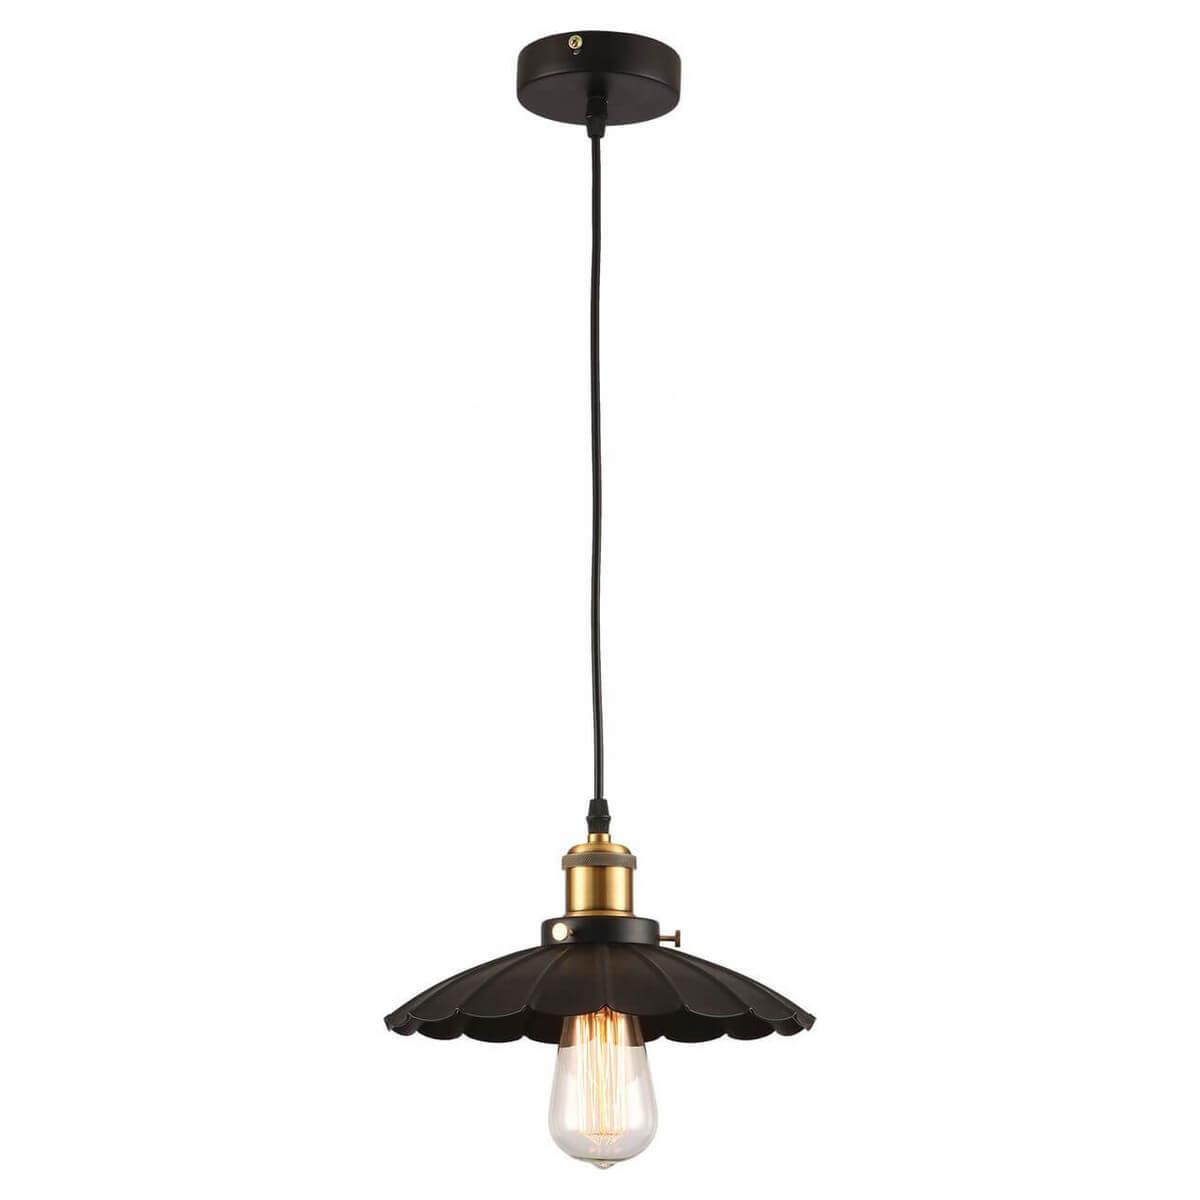 Подвесной светильник Lussole LOFT LSP-9602, E27, 60 Вт цена